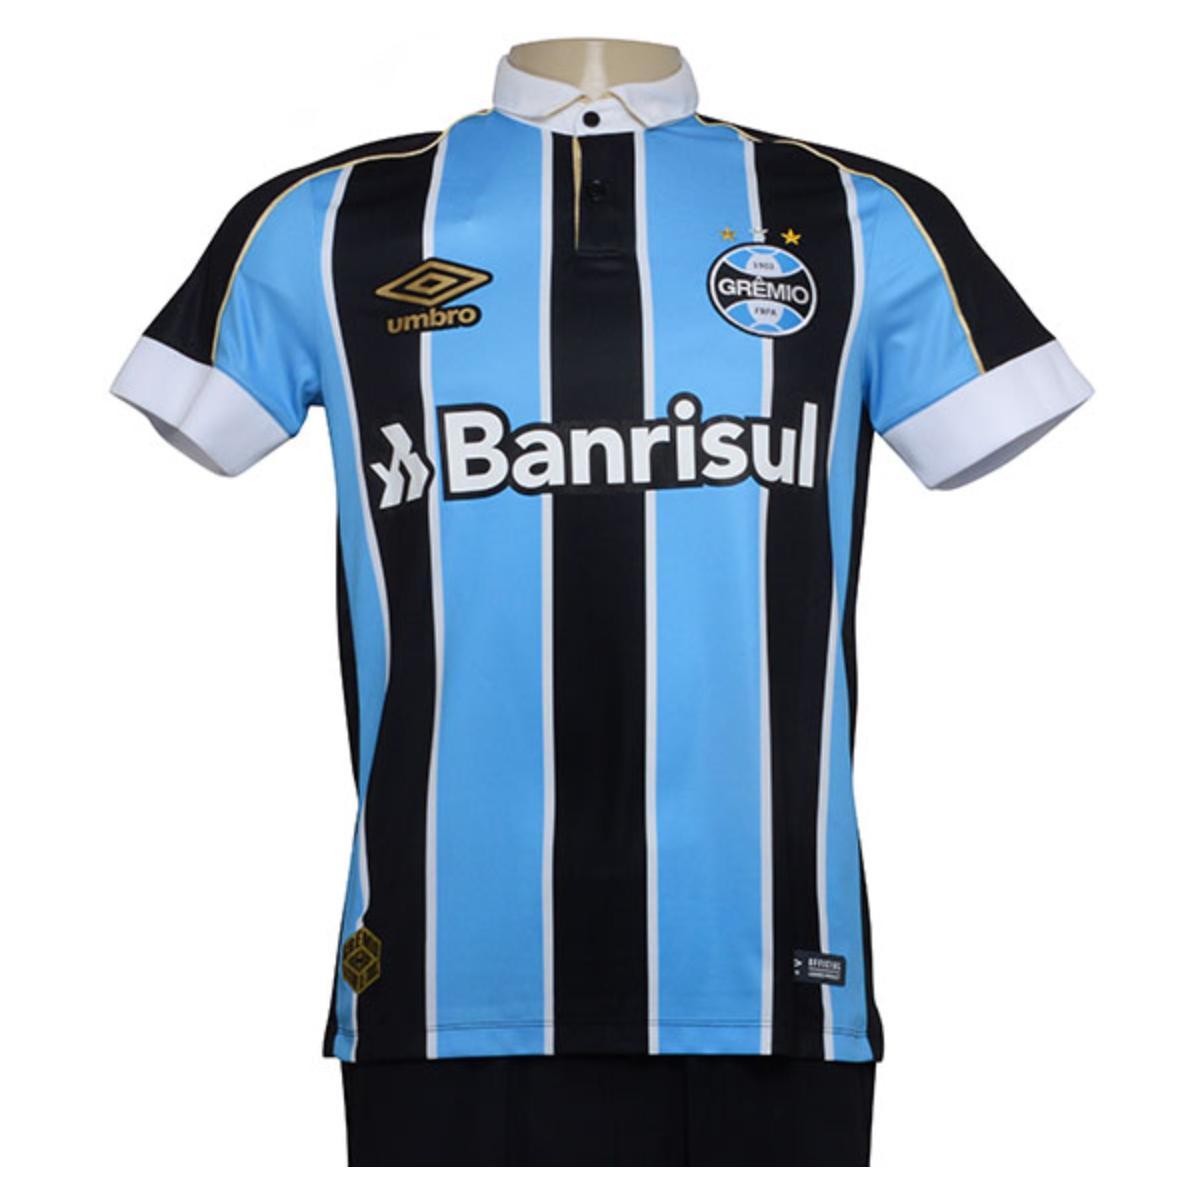 Camiseta Masculina 3g160779 Grêmio Of.1 2019 Classic Tricolor